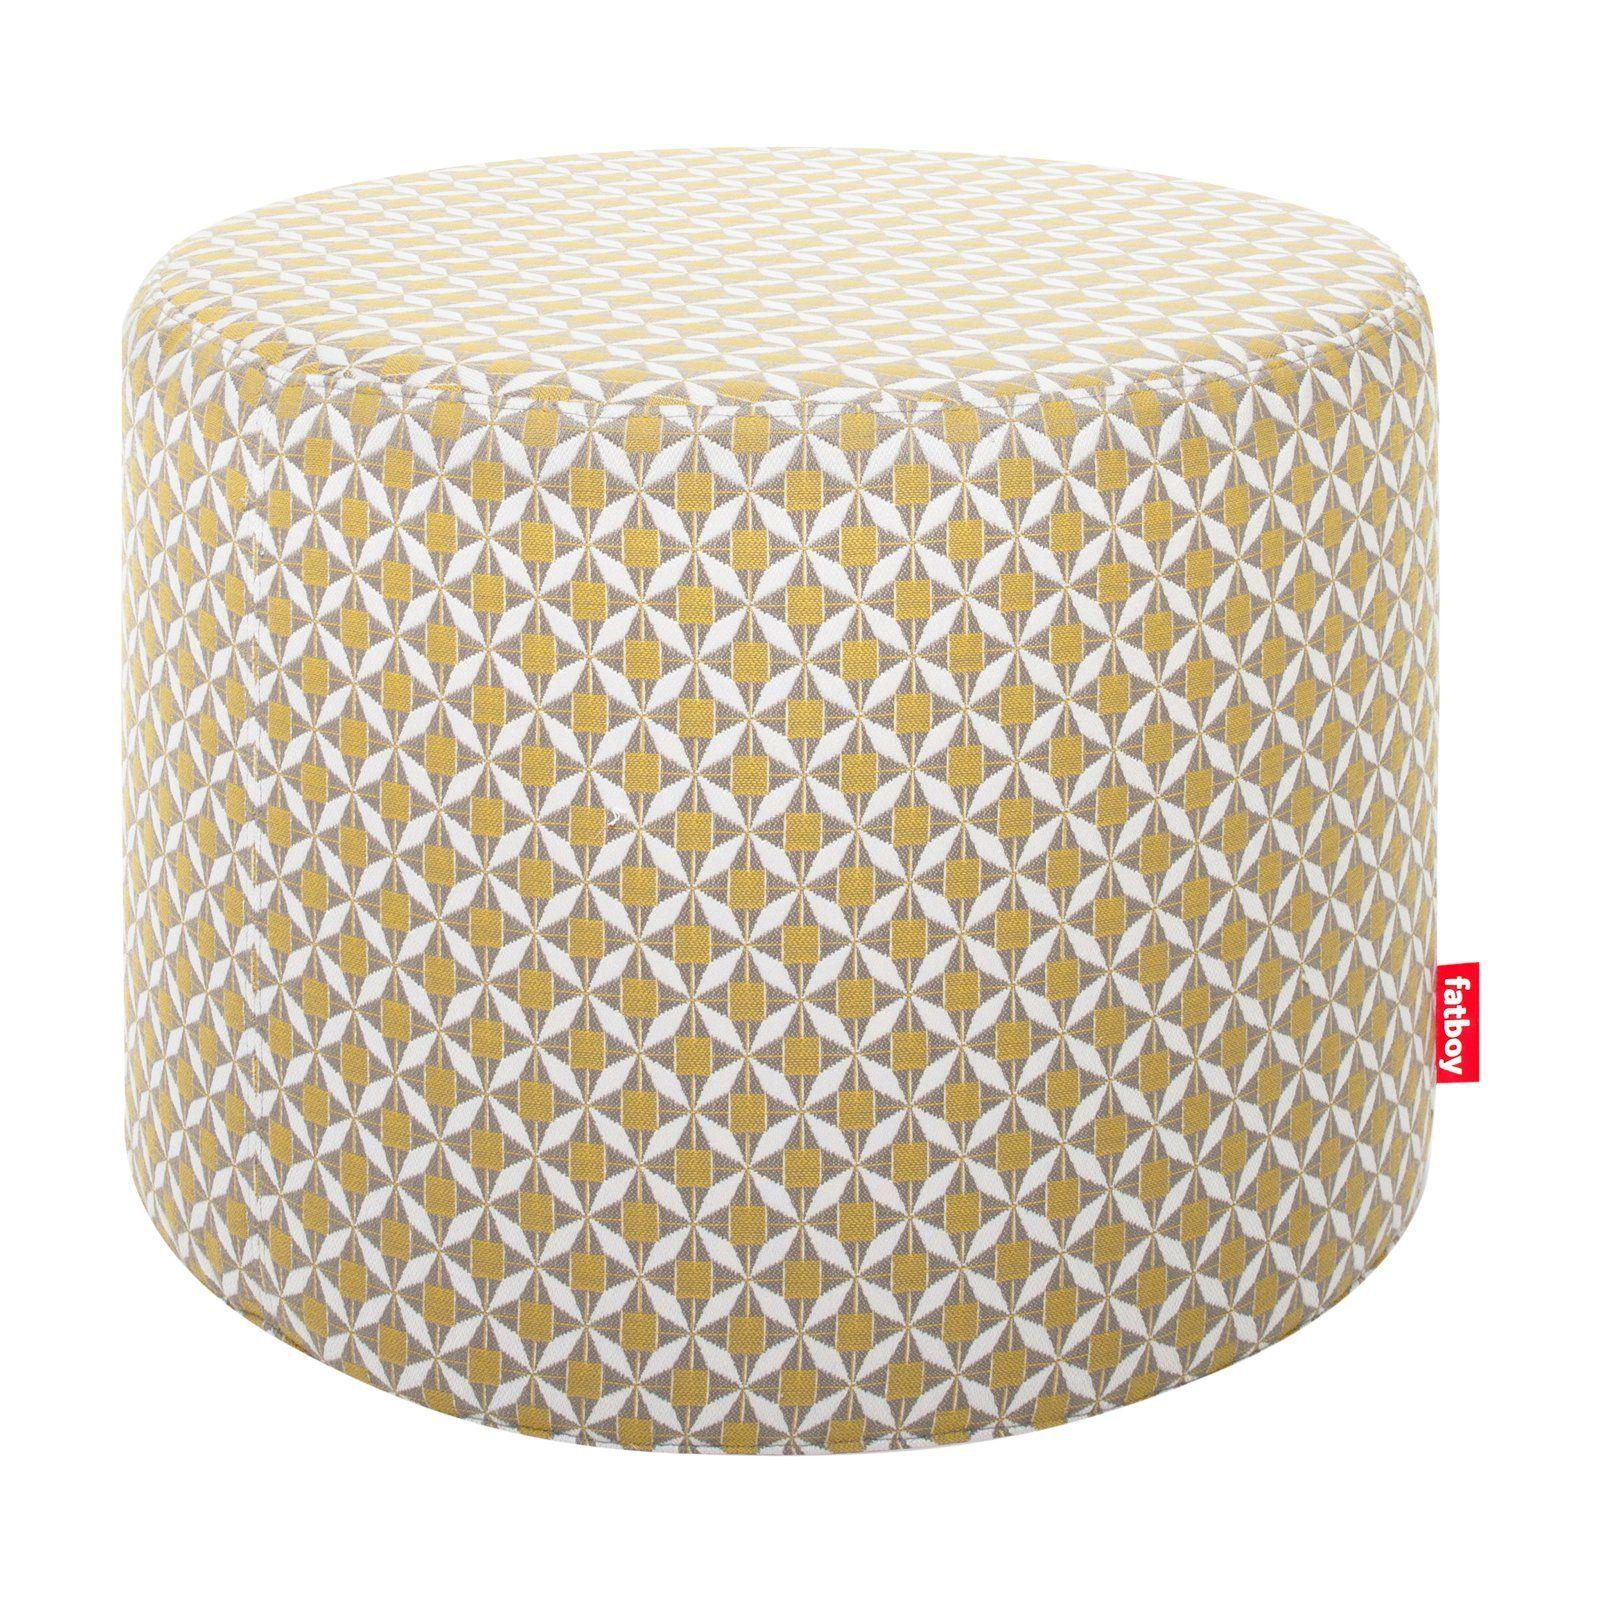 Enjoyable Fatboy Rondeju Geometric Sunbrella 24 Diam Indoor Outdoor Machost Co Dining Chair Design Ideas Machostcouk